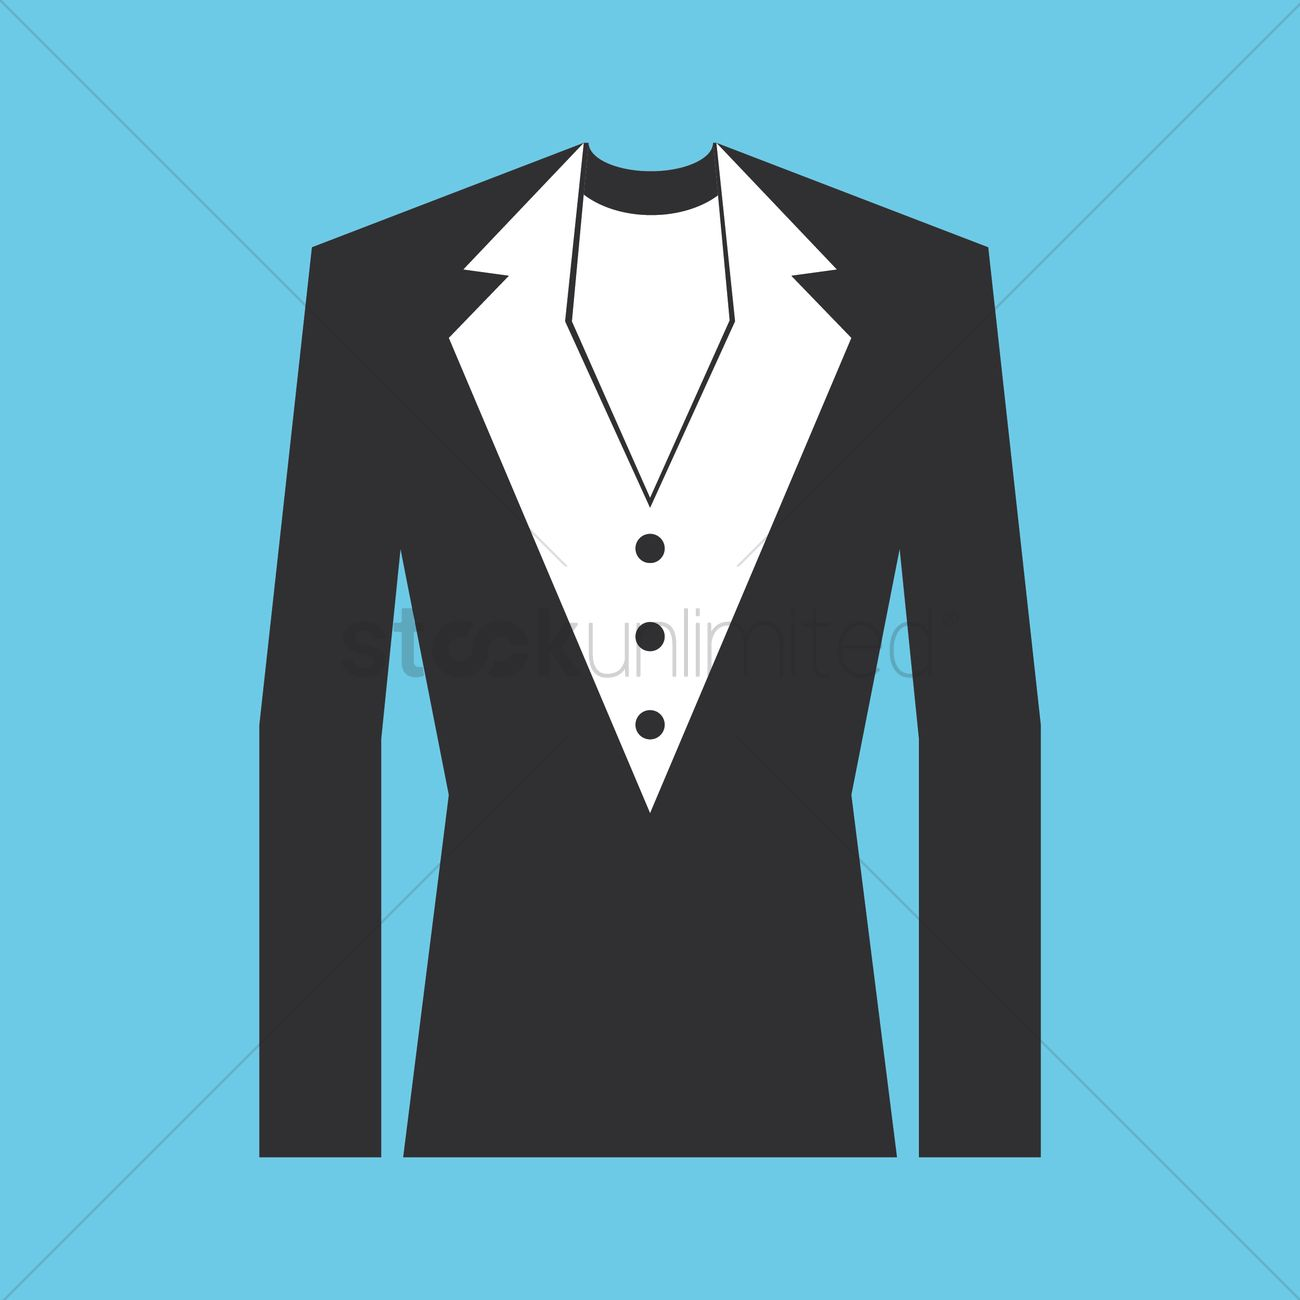 Bridegroom suit Vector Image - 1359202 | StockUnlimited